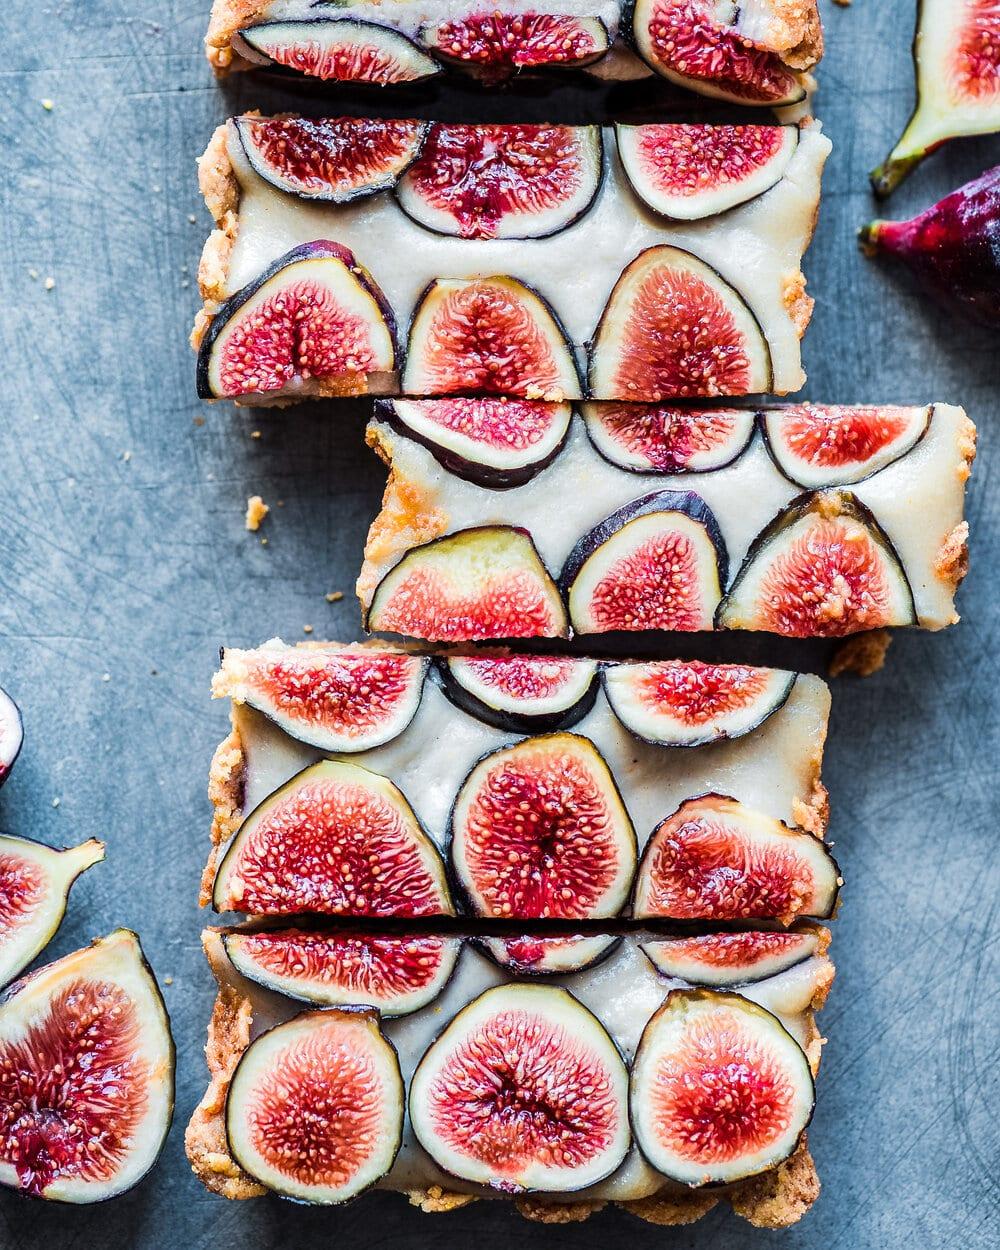 Fig Tart with Coconut-Cashew Cream (Vegan, Gluten-Free)